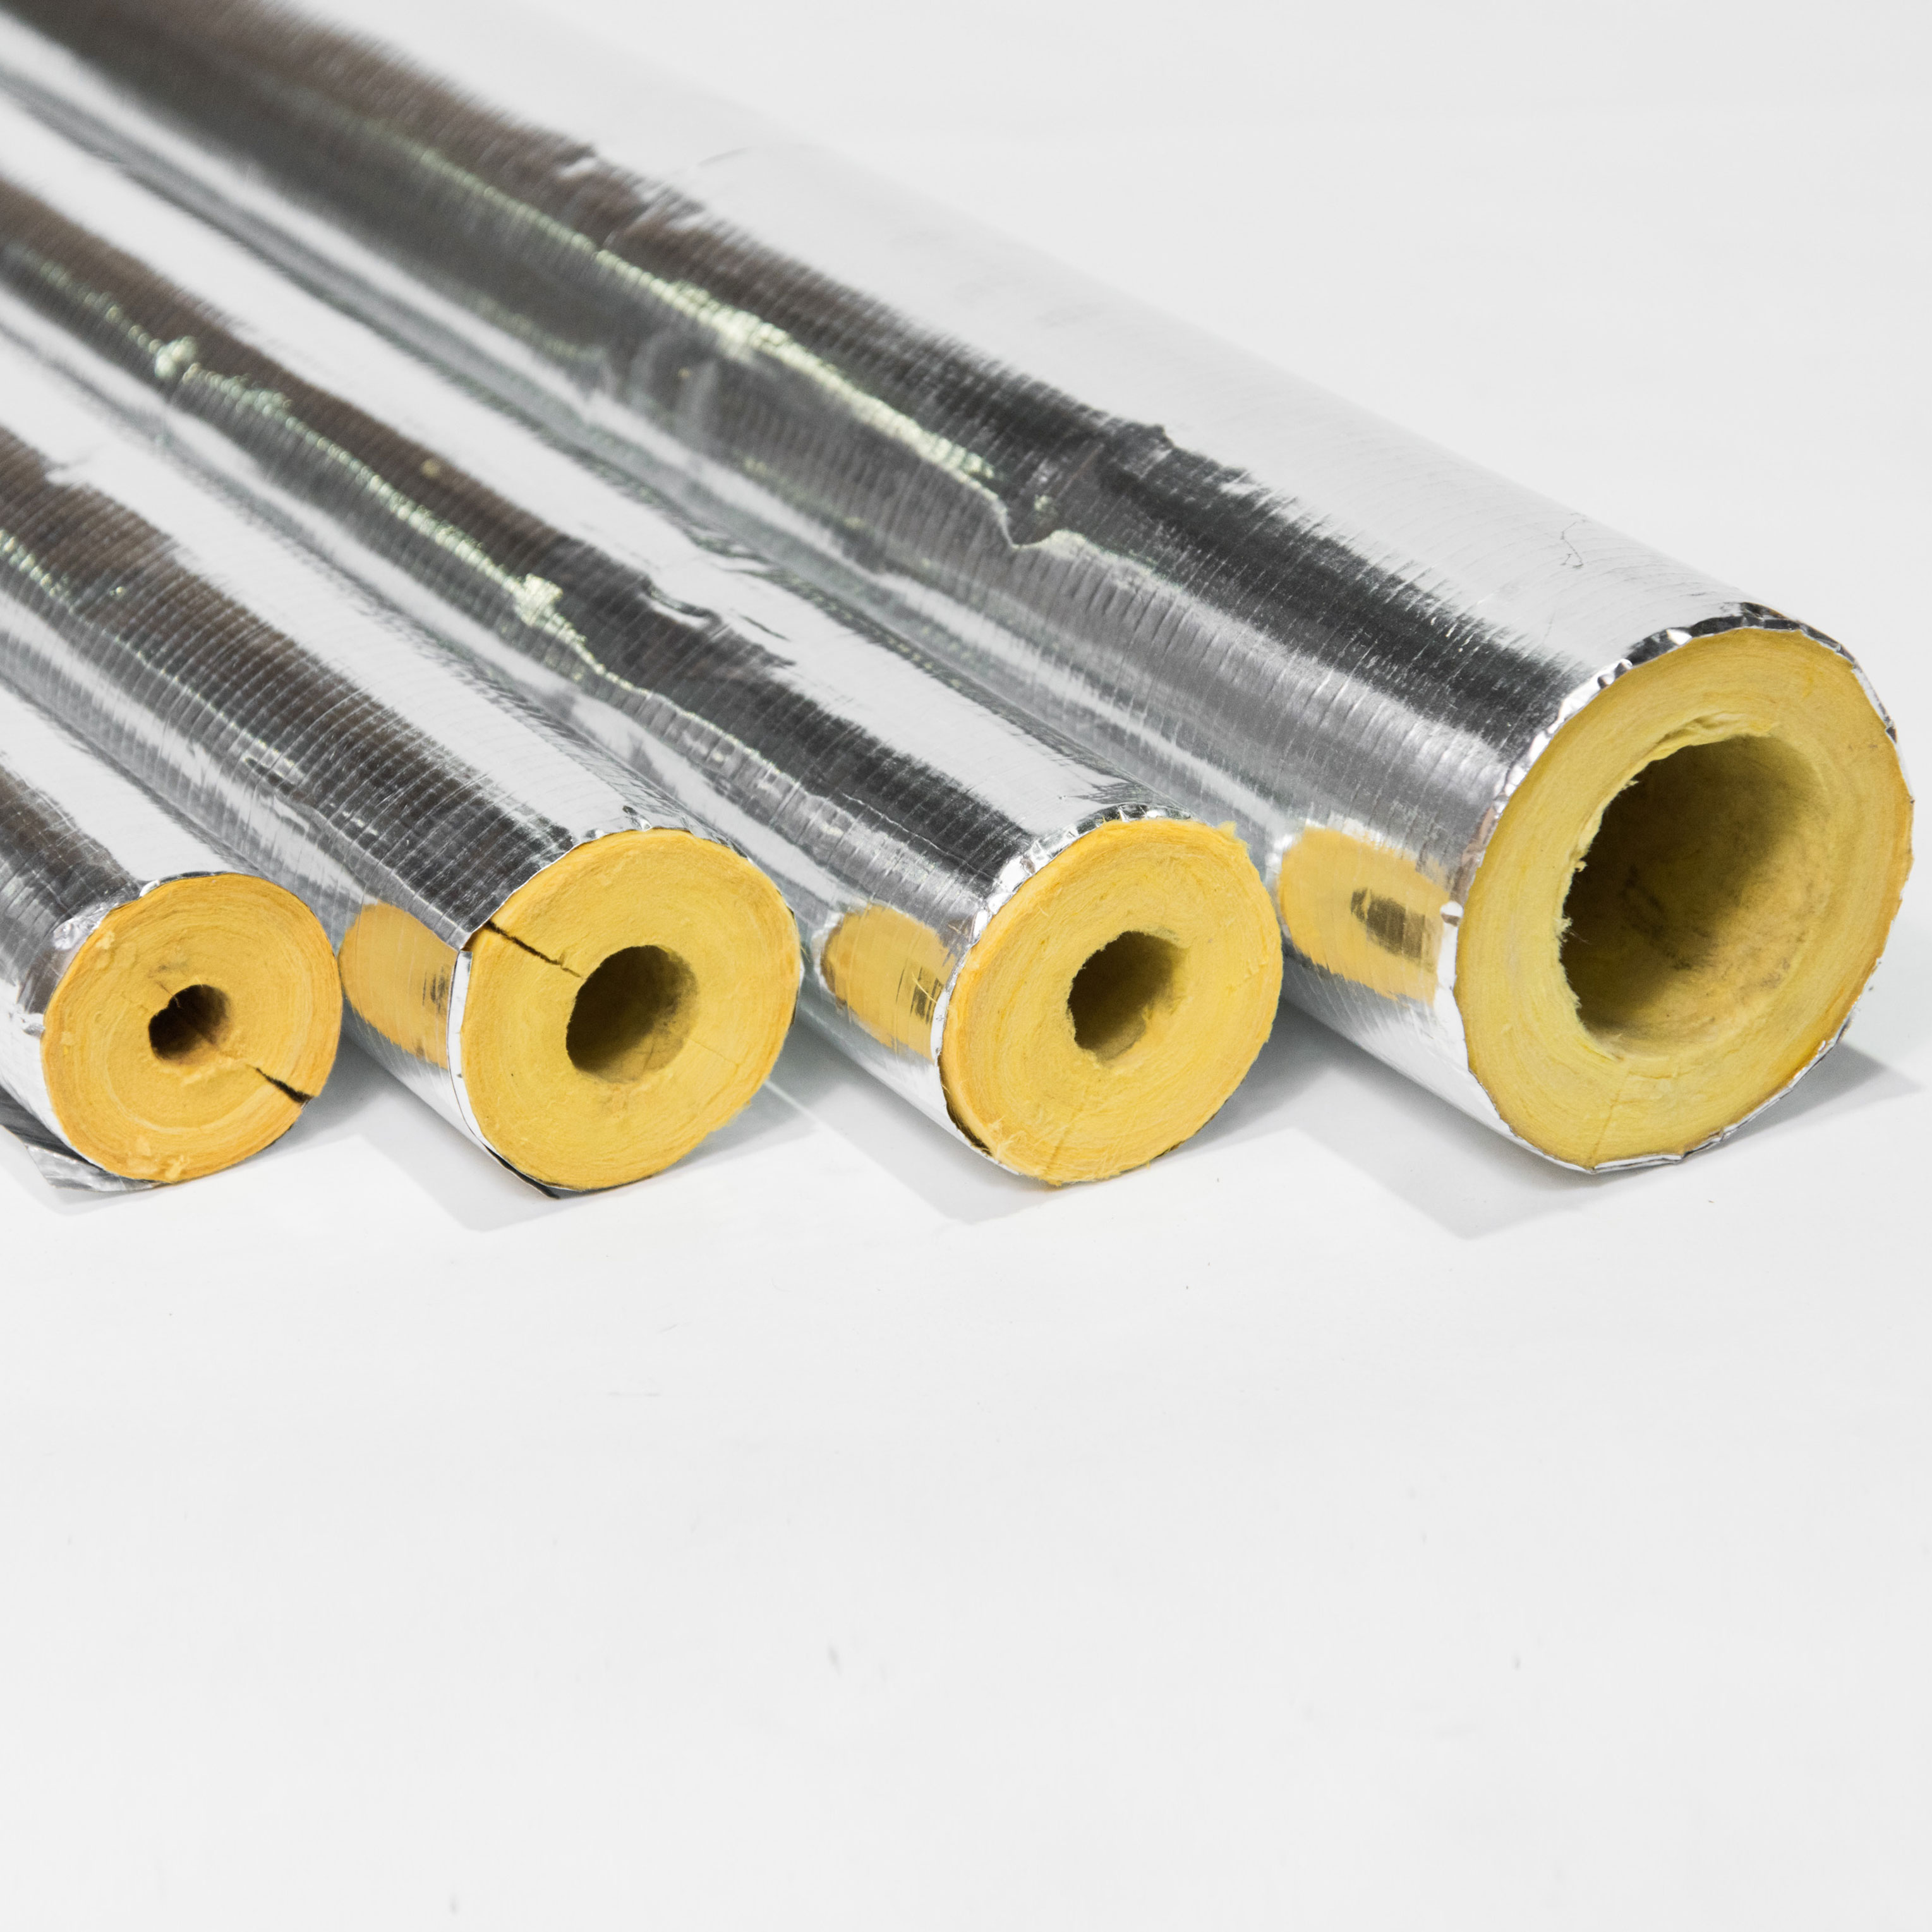 kimmco pipe insulation